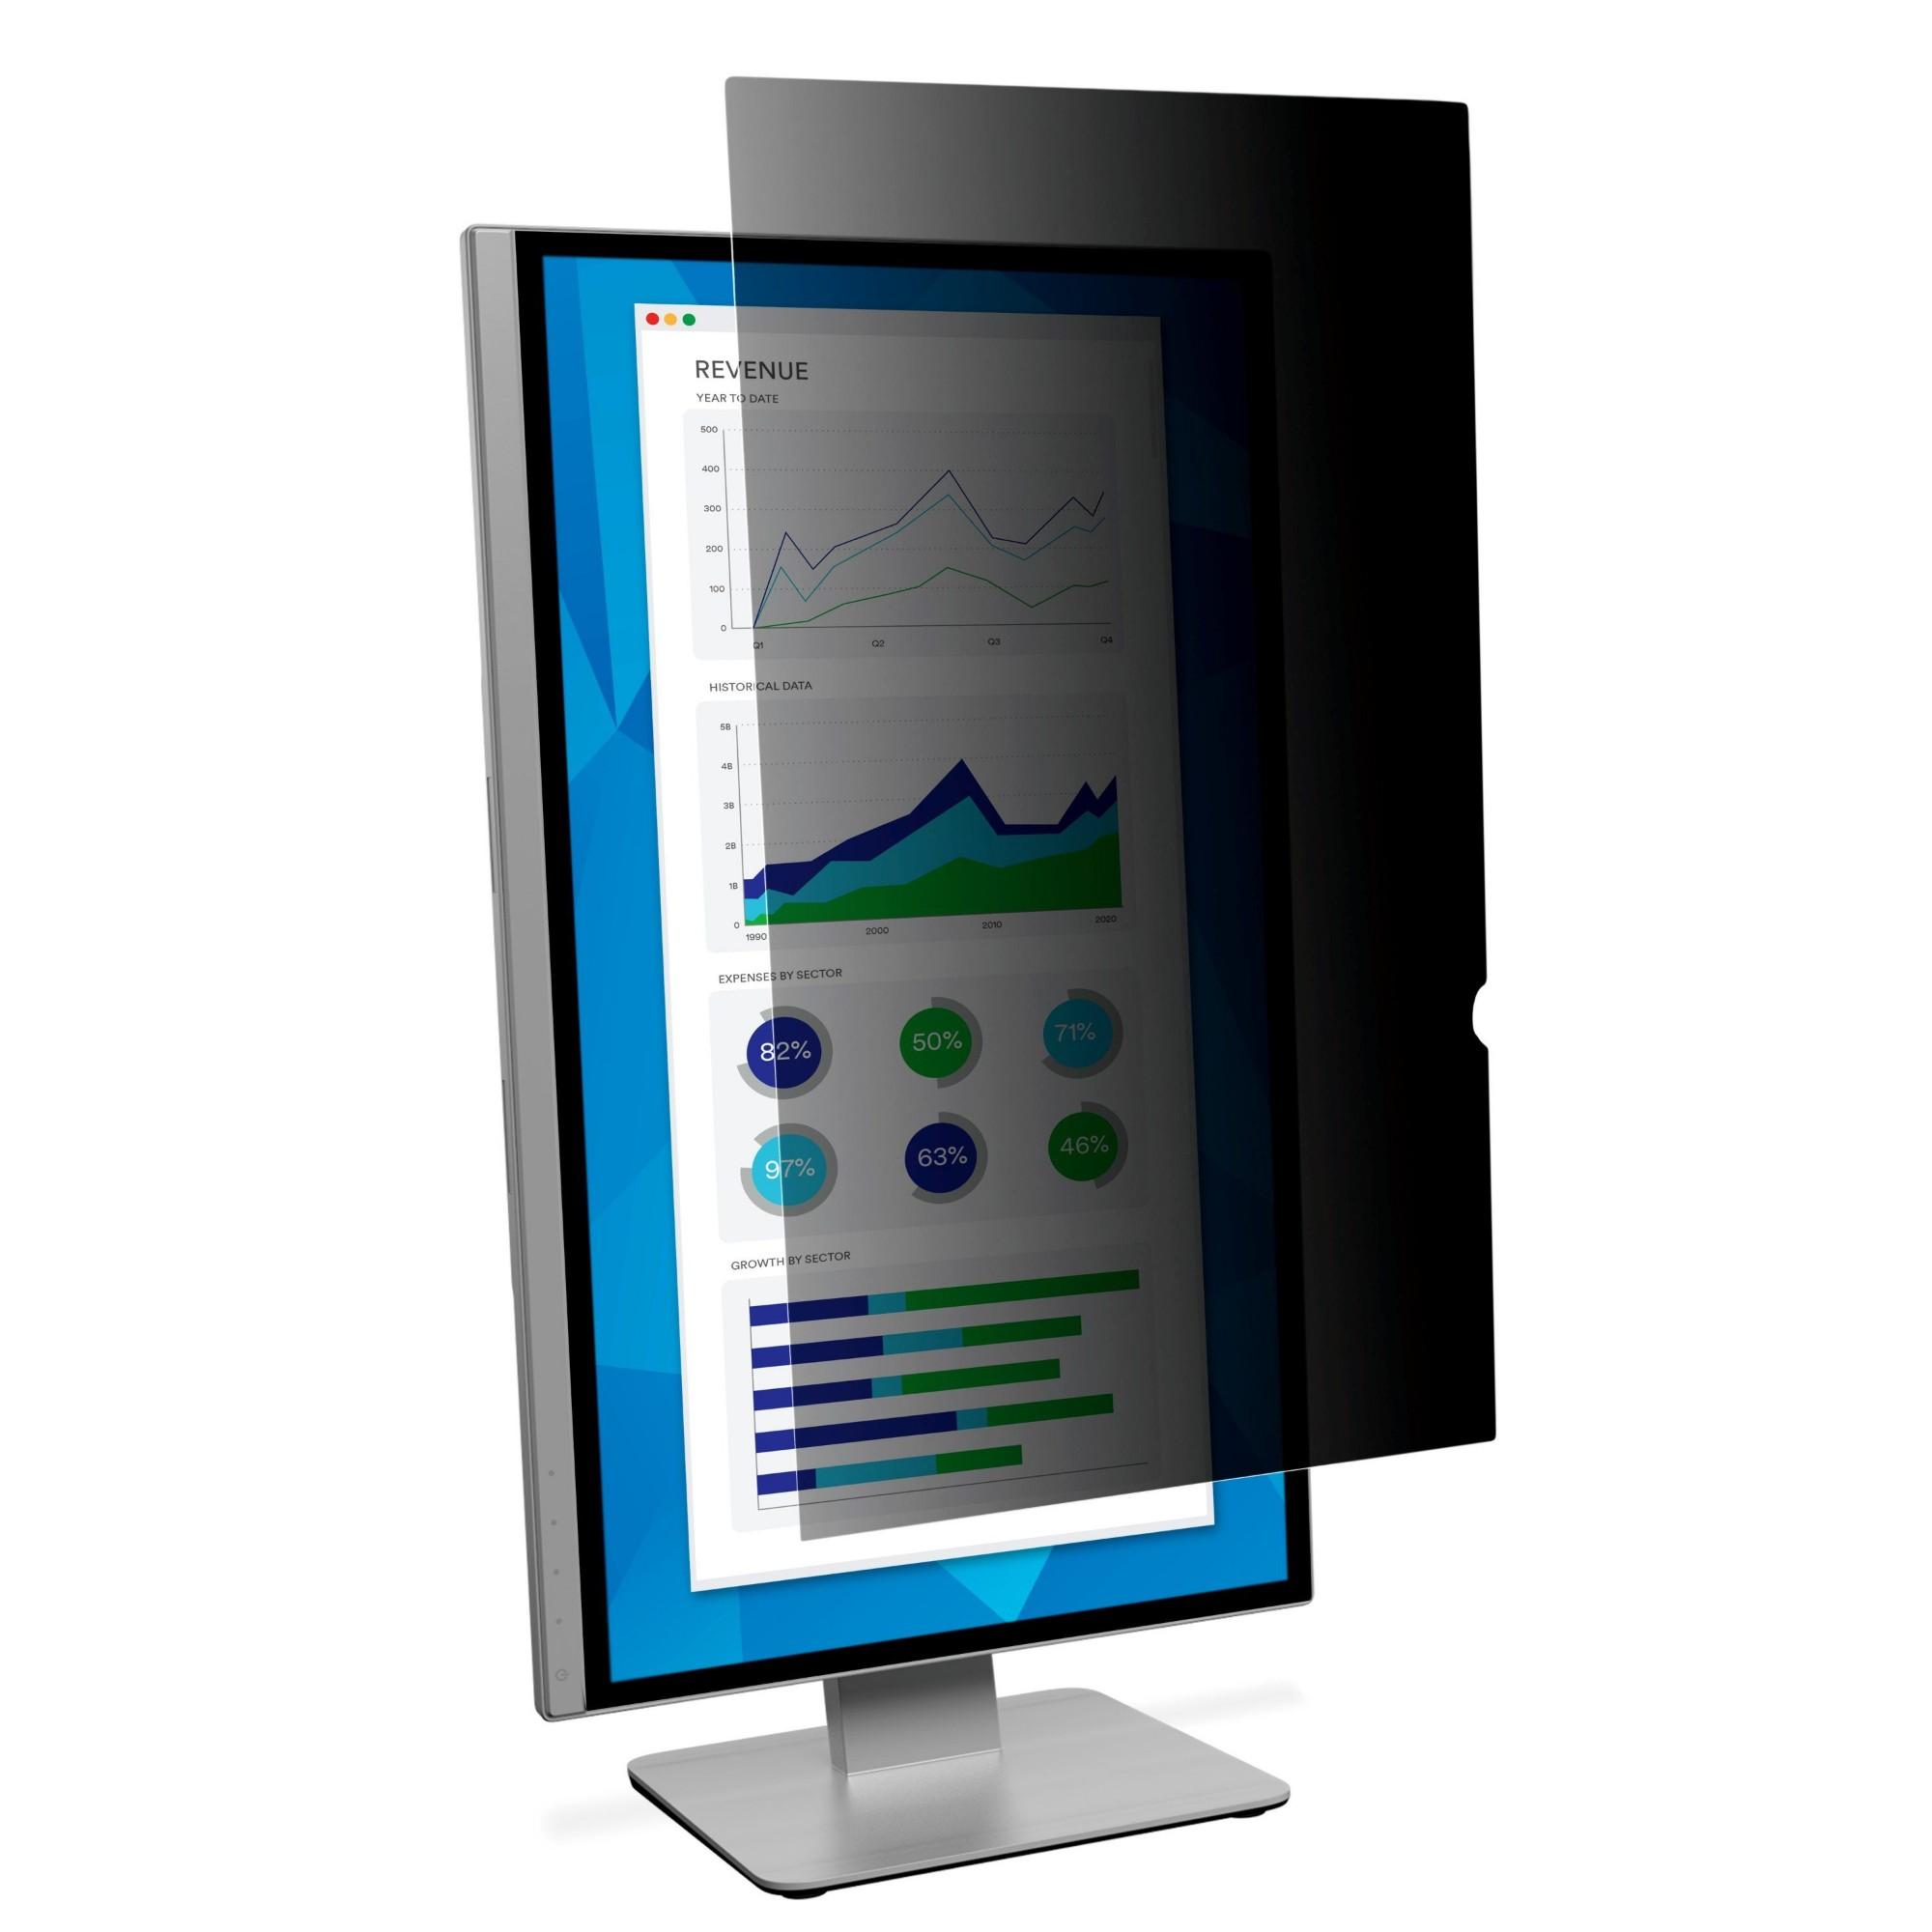 Privacy Filter Pf215w9p For 21.5in Widescreen Portrait Monitor